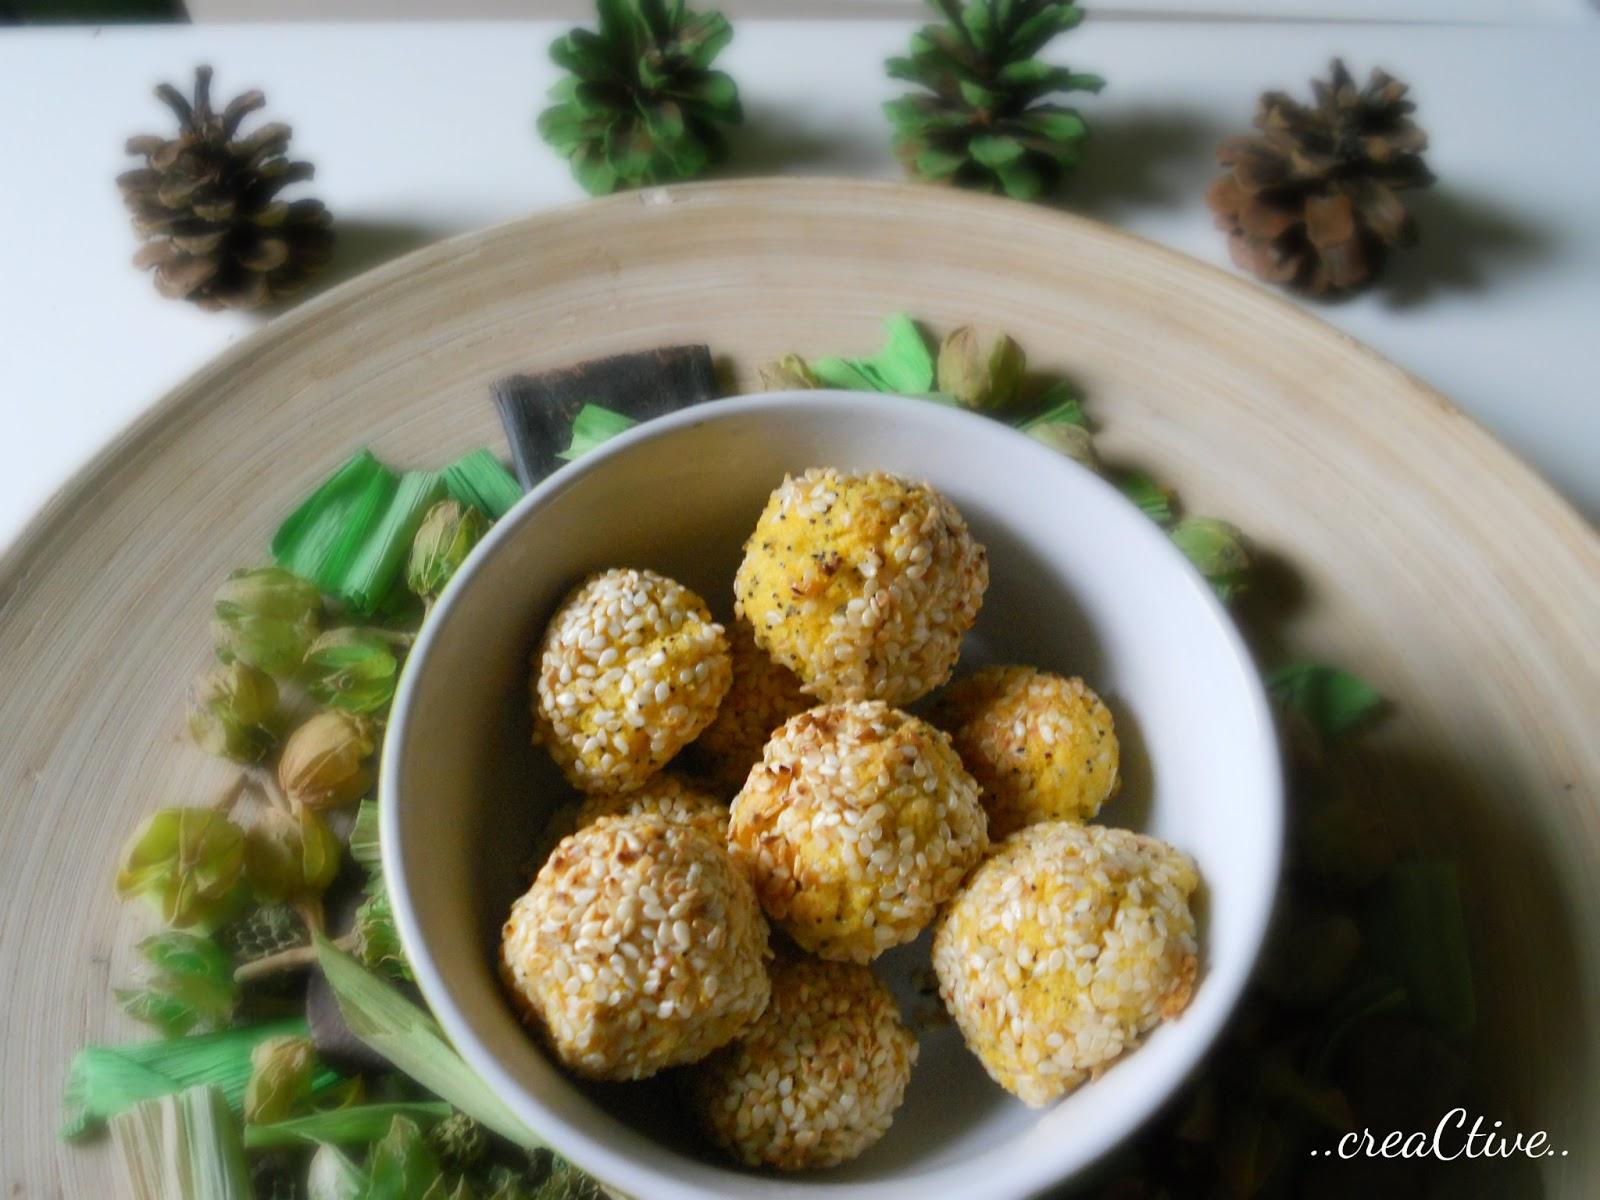 Small polenta balls, to spice up the party of yours | Aleksandra Birta